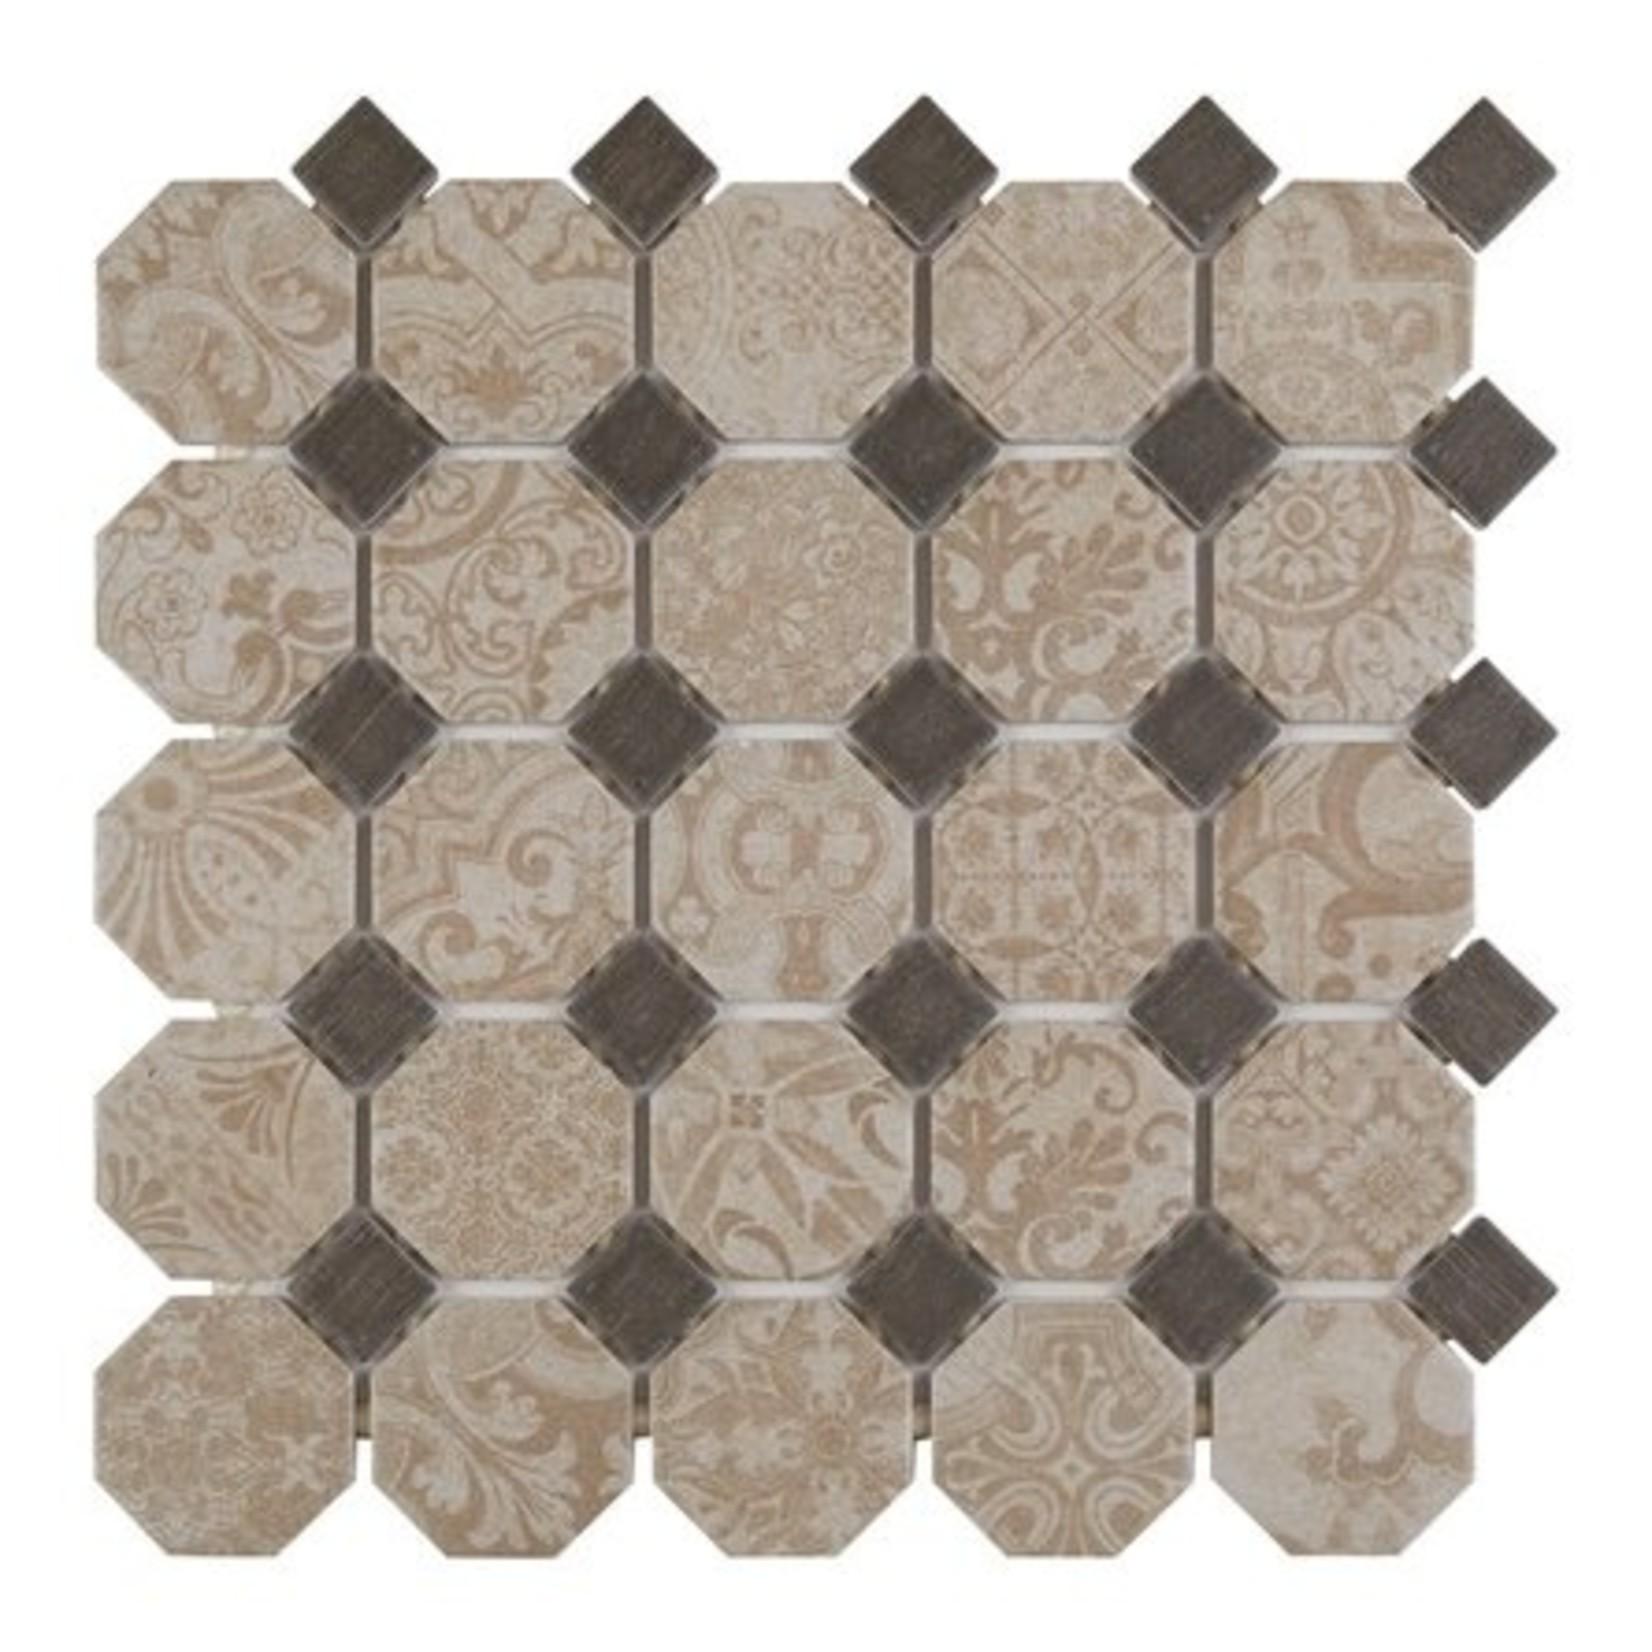 "*Rhetoric 2"" x 2"" Porcelain Octagon and Dot Mosaic Tile - 10 Sq.Ft."